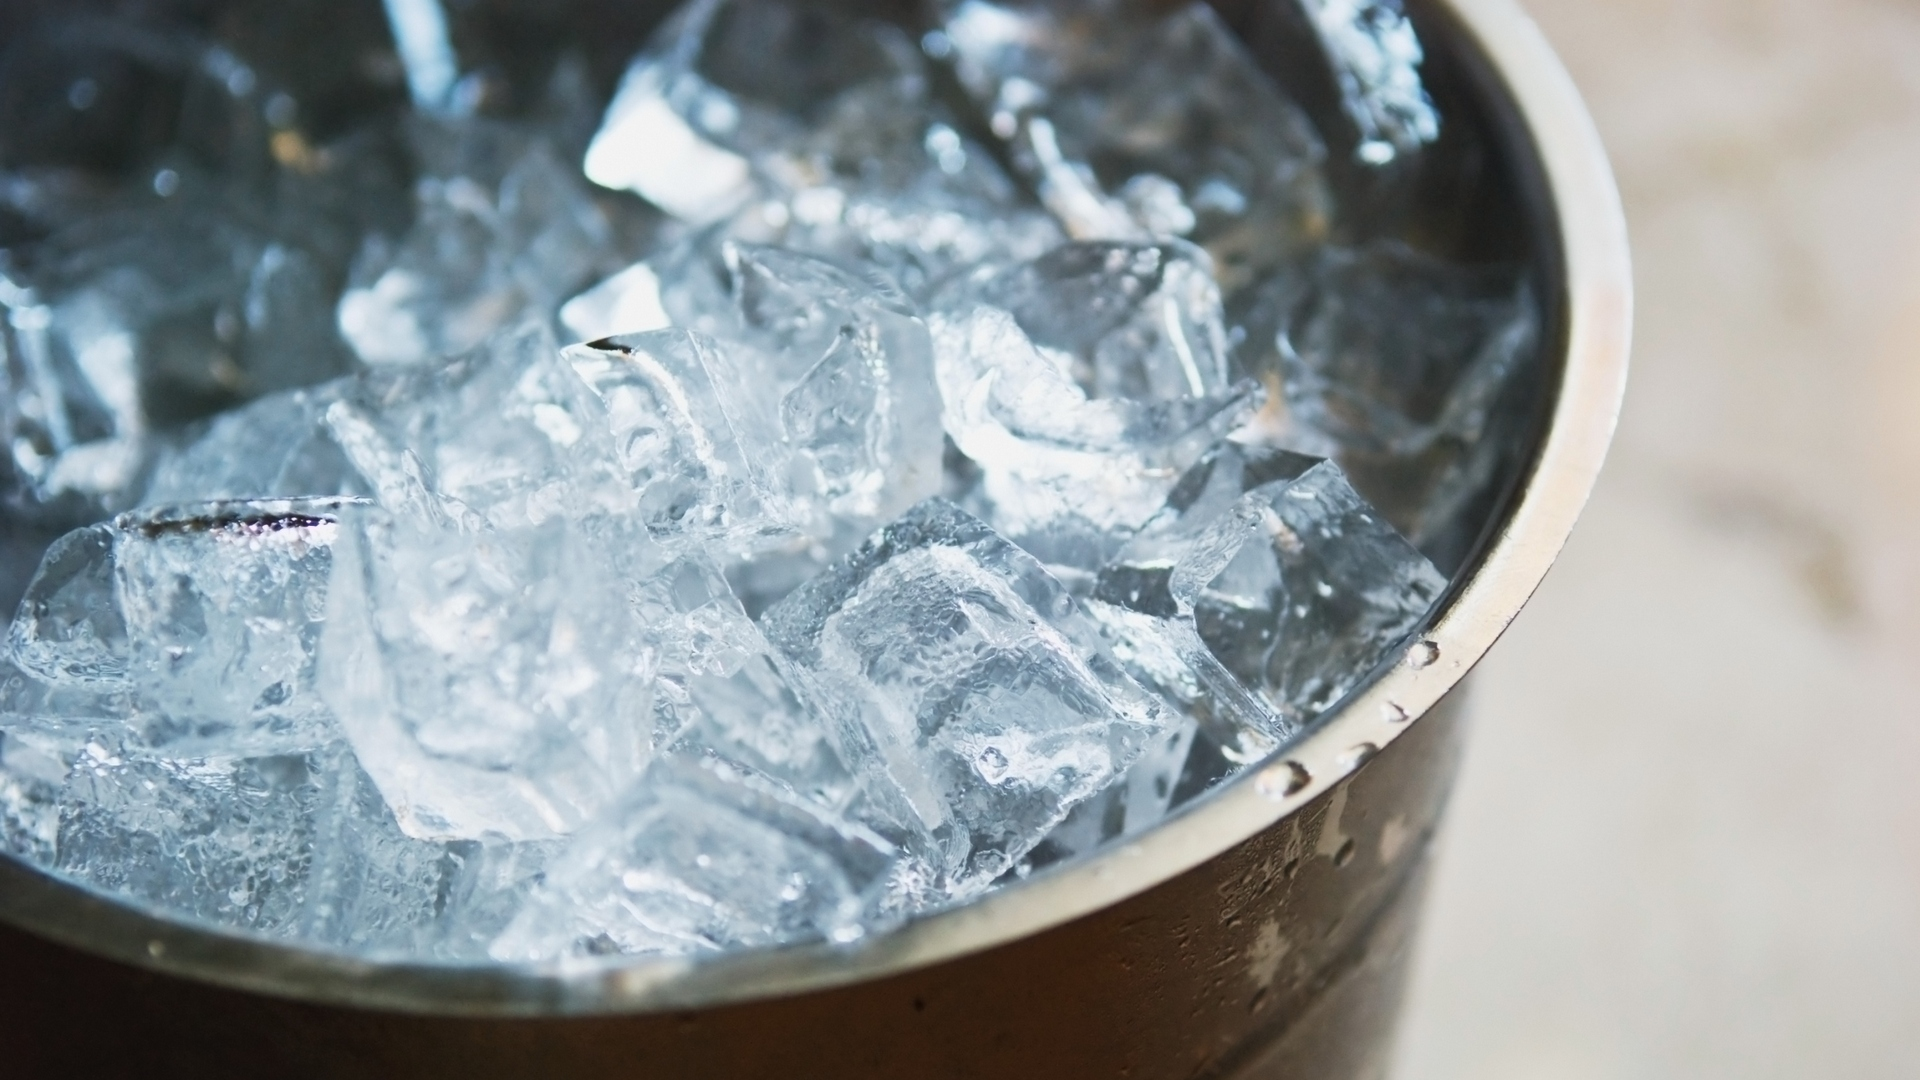 Pregnant ice bucket challenge